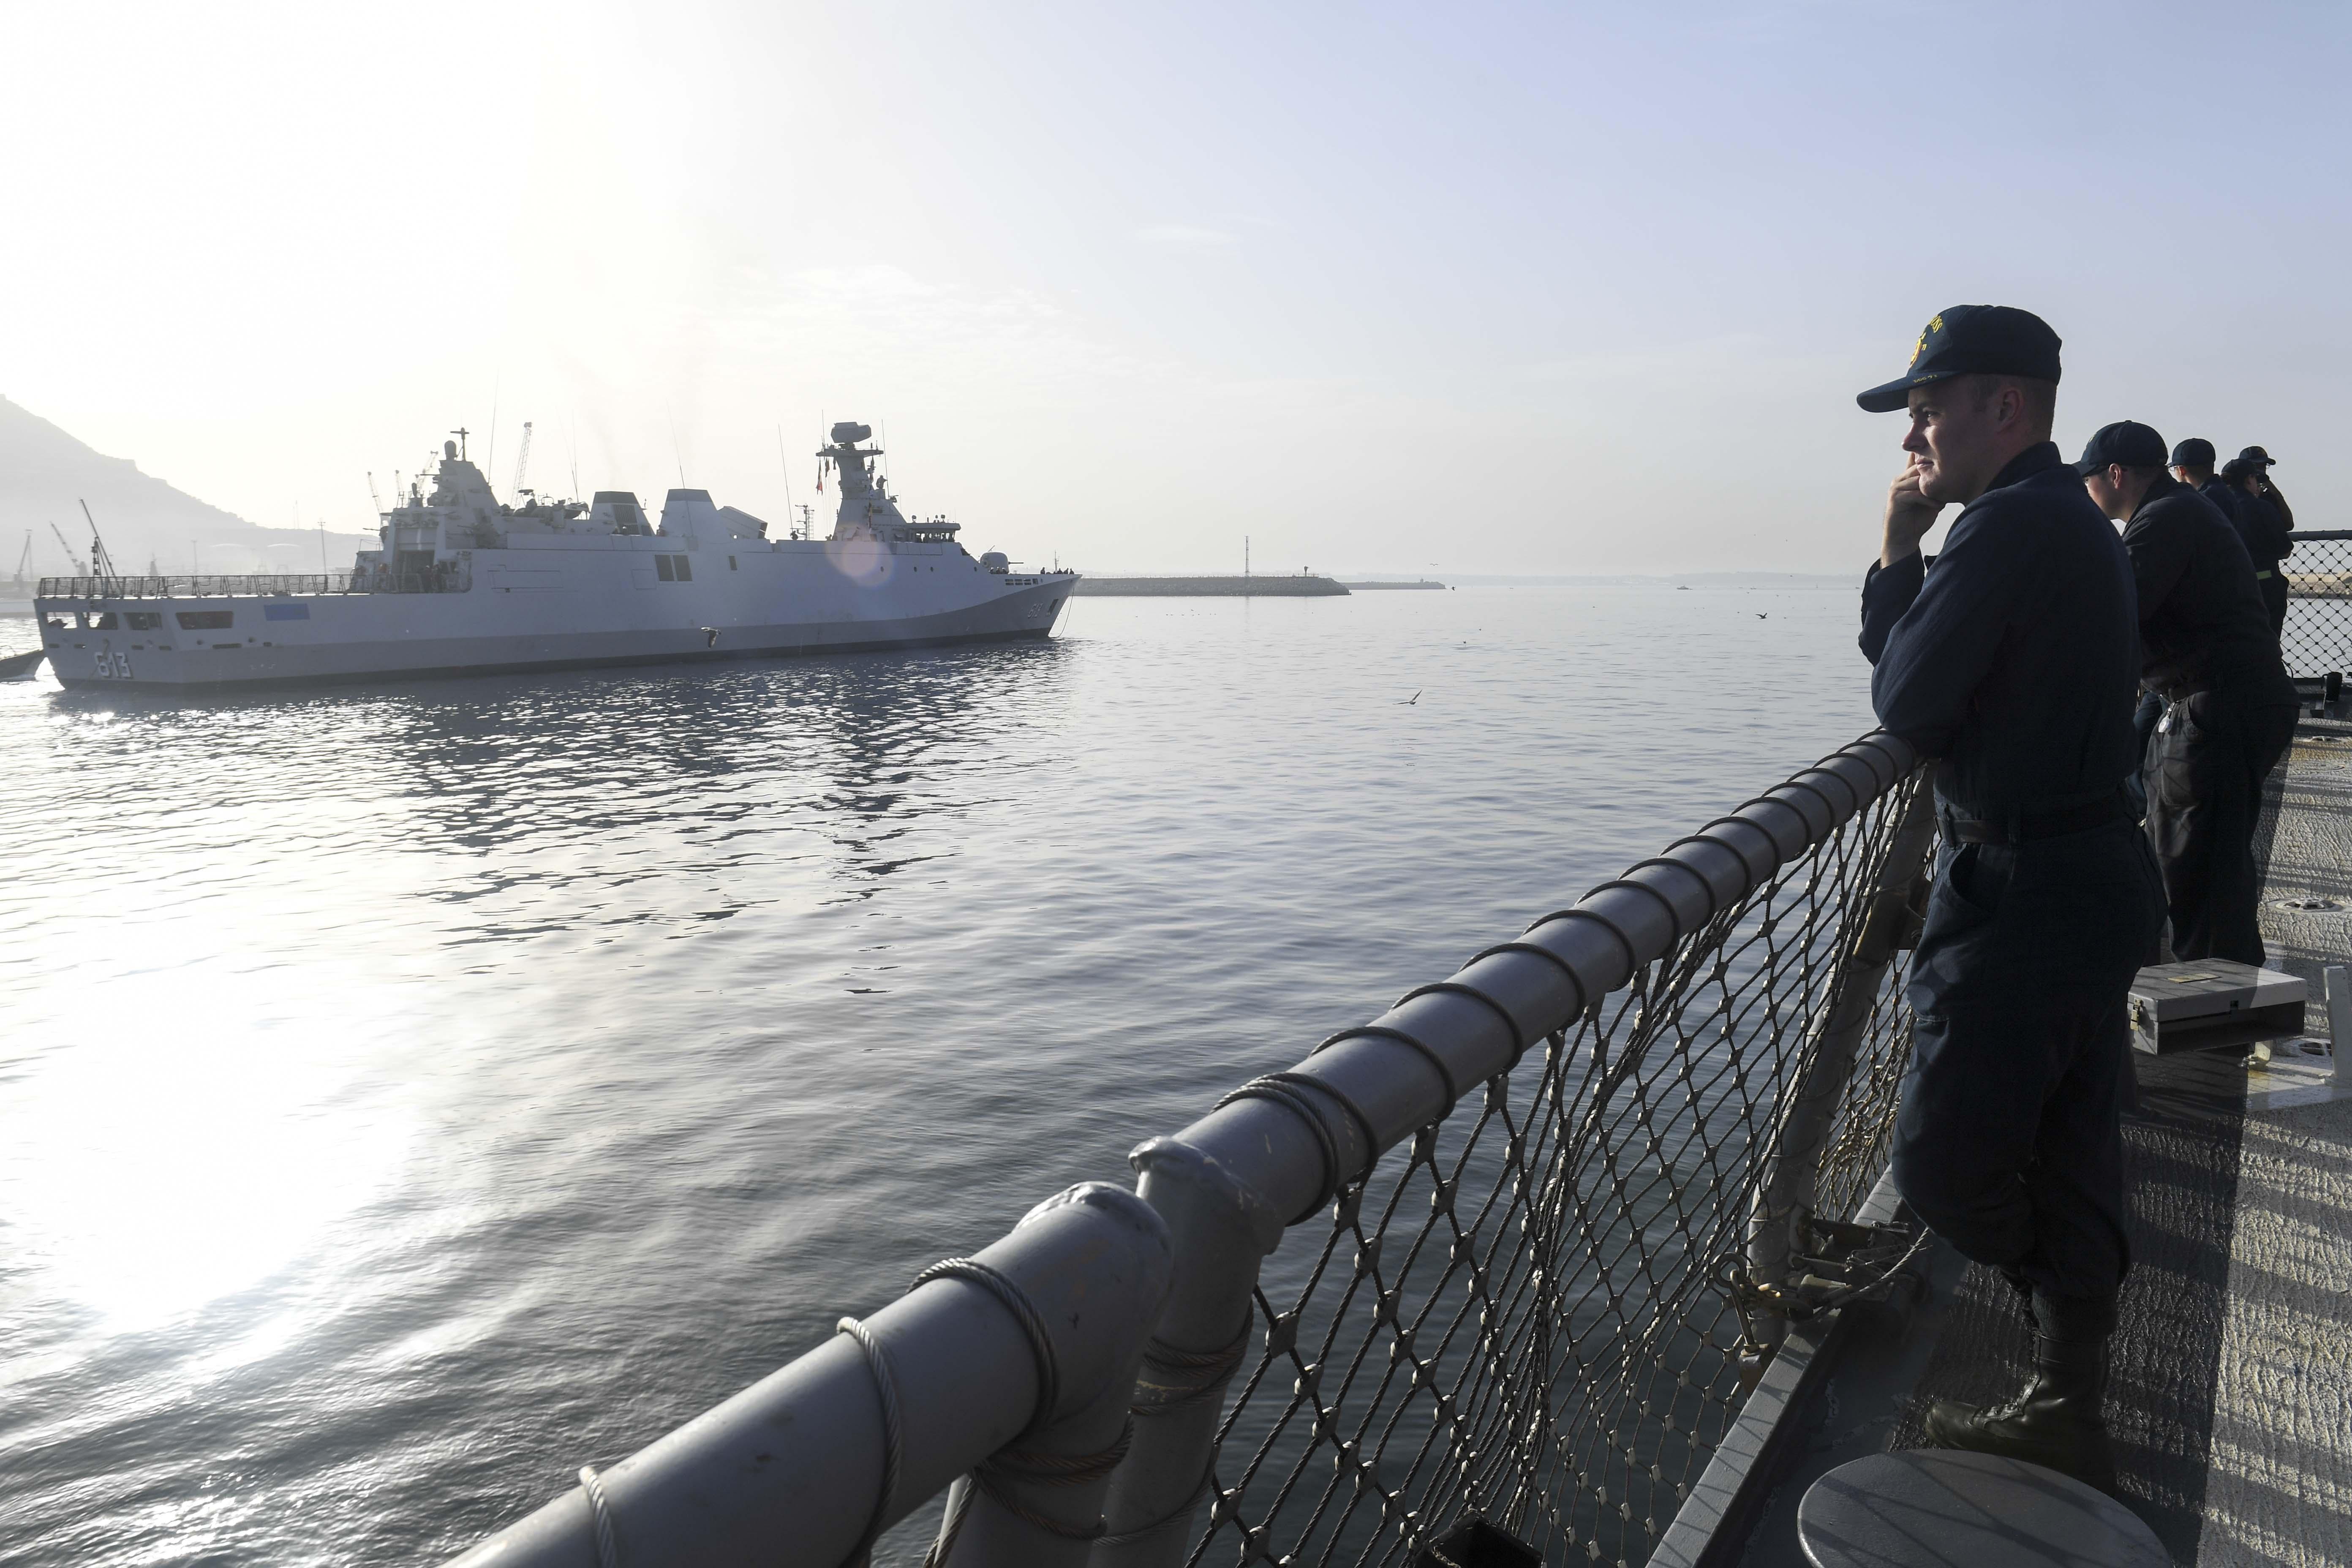 PASSEX 18 - USS ROSS (DDG71) et RMN Tarik Ben Ziyad (613) 43999042682_83c1f5924e_o